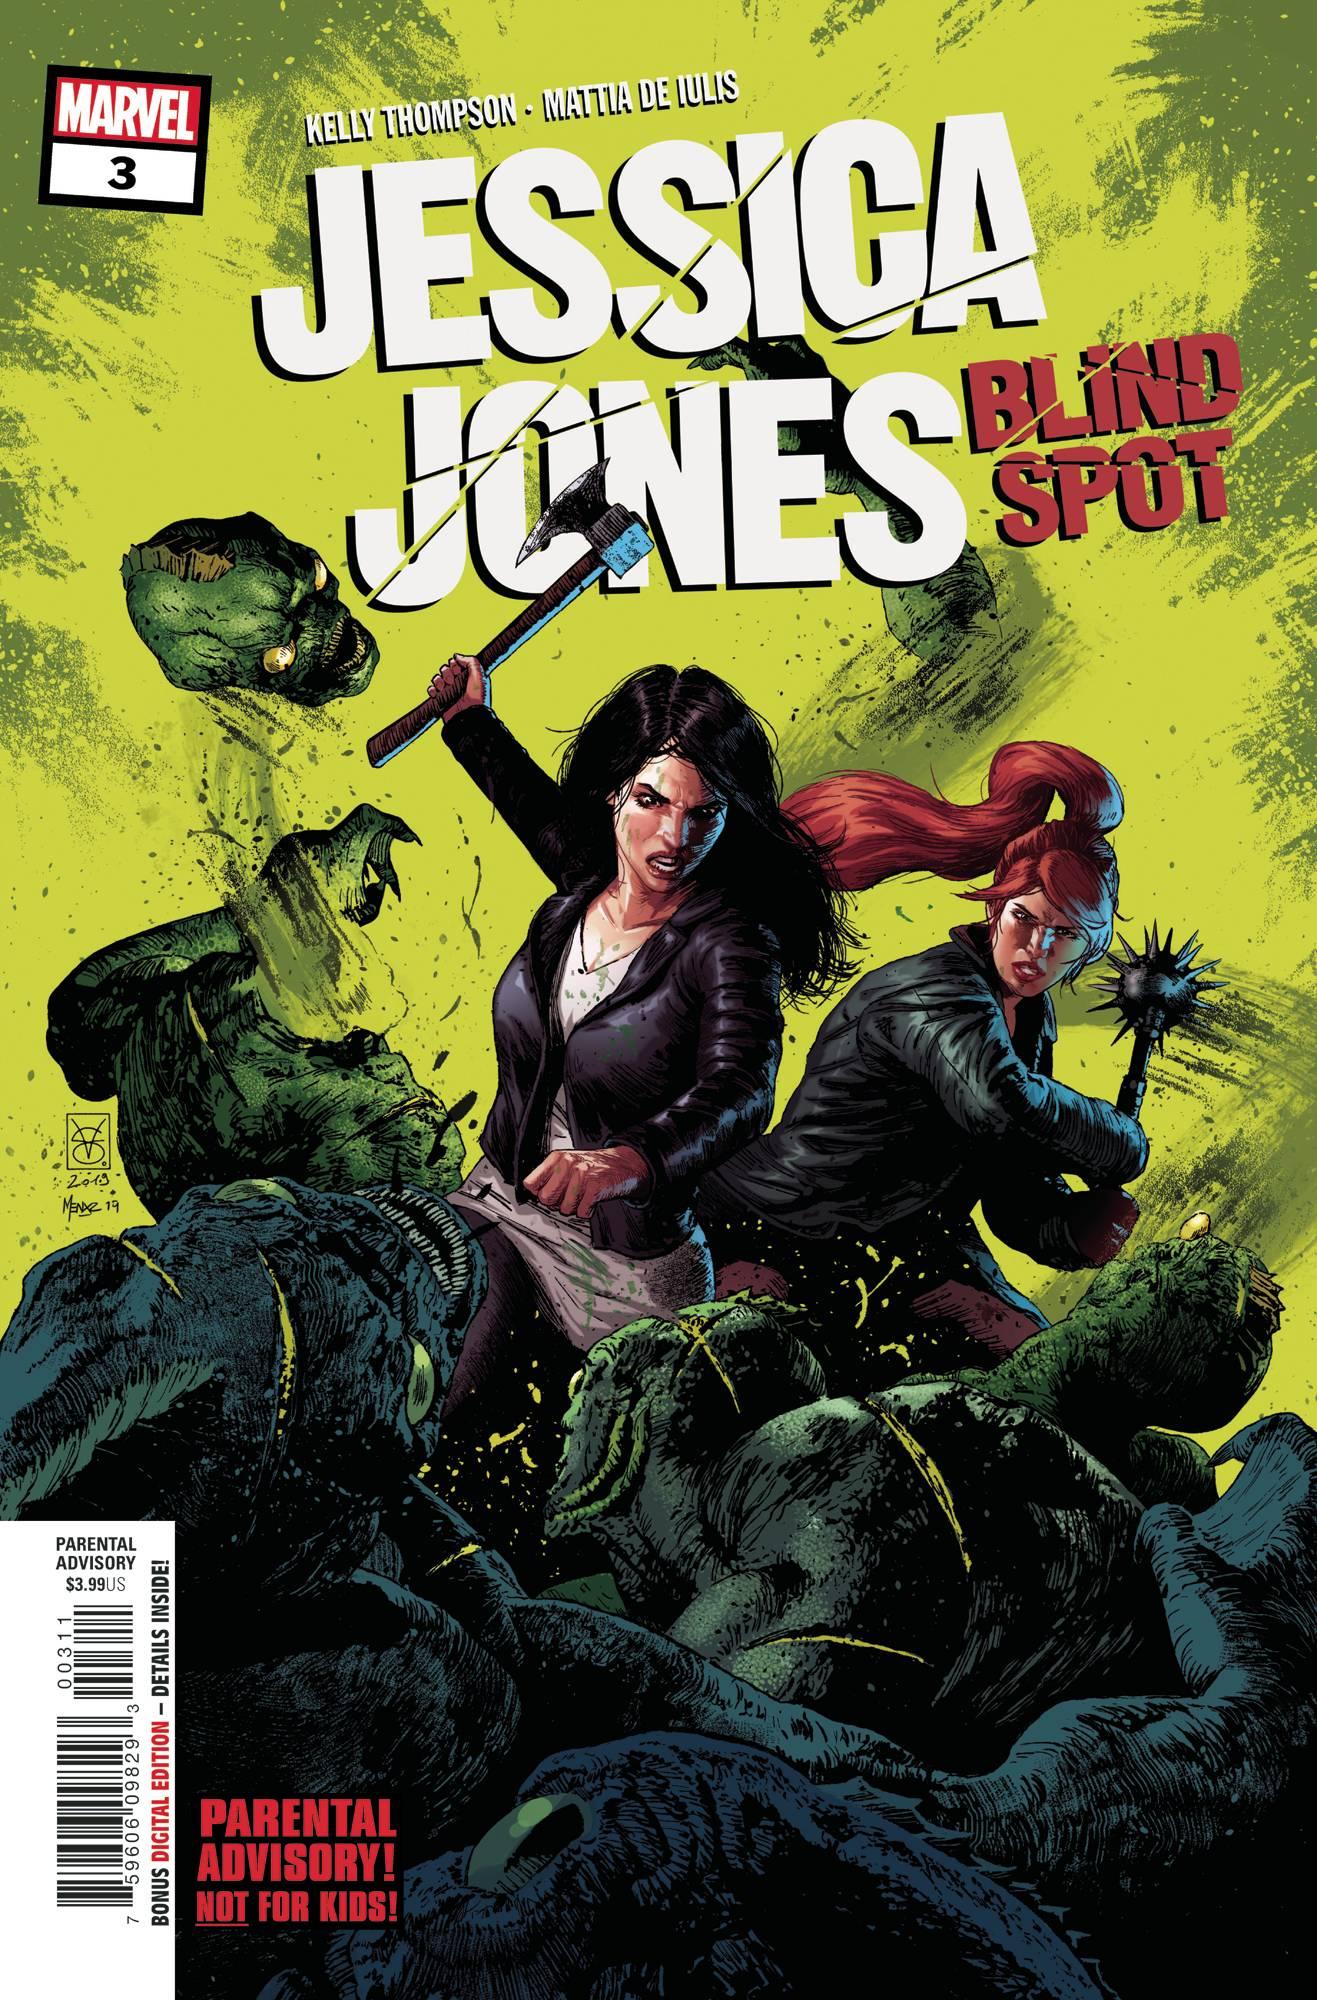 Jessica Jones Blind Spot #3